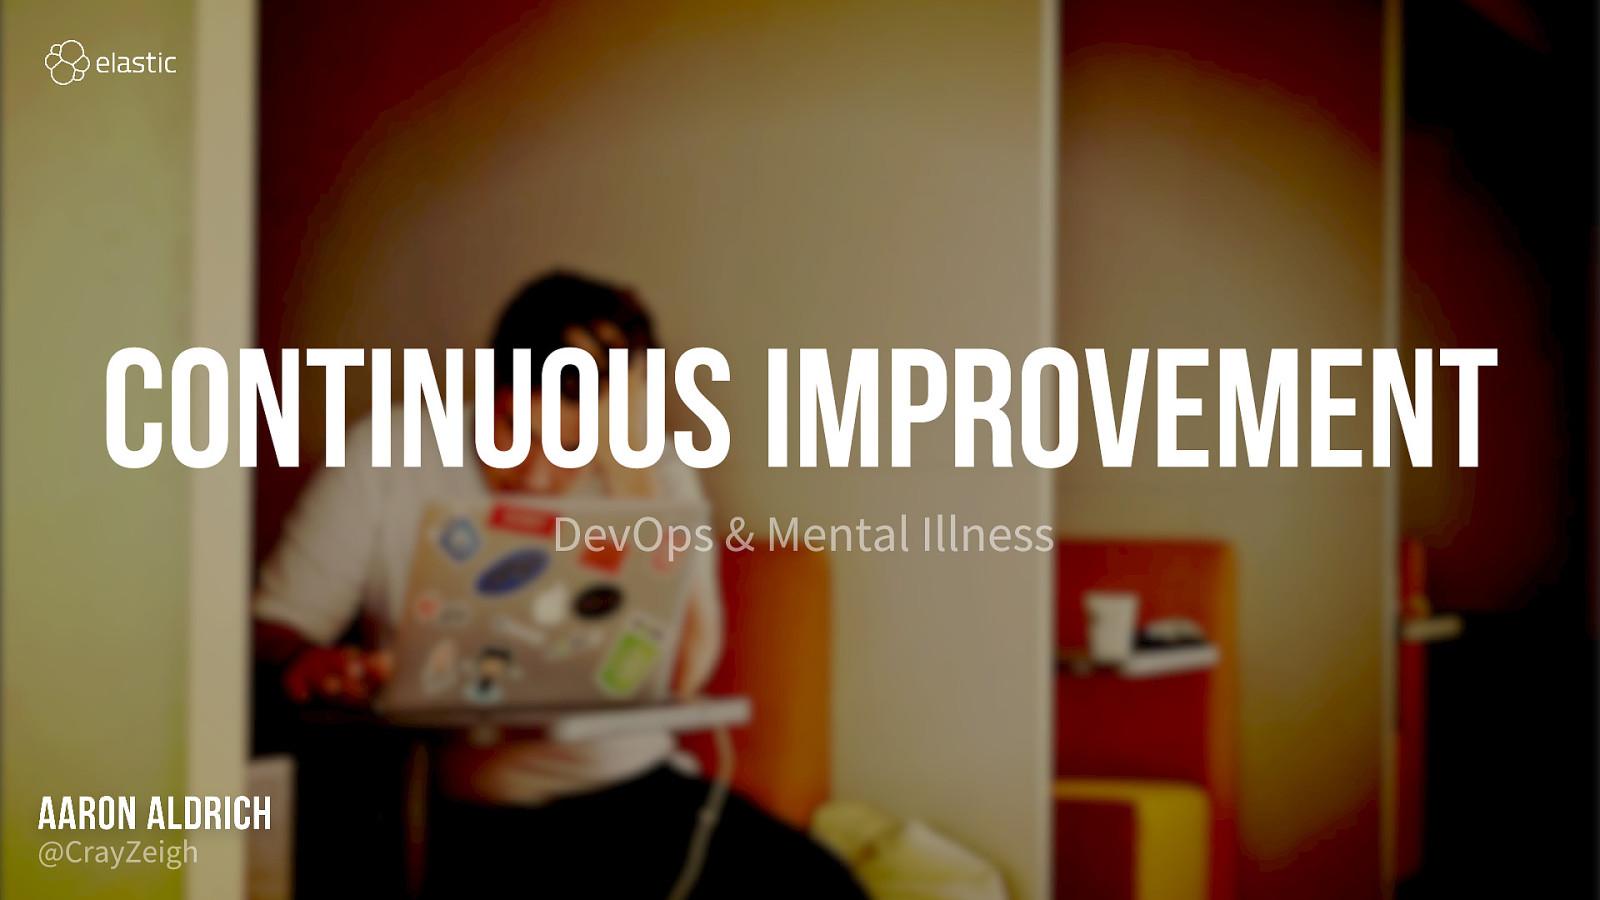 Continuous Improvement, DevOps and Mental Illness